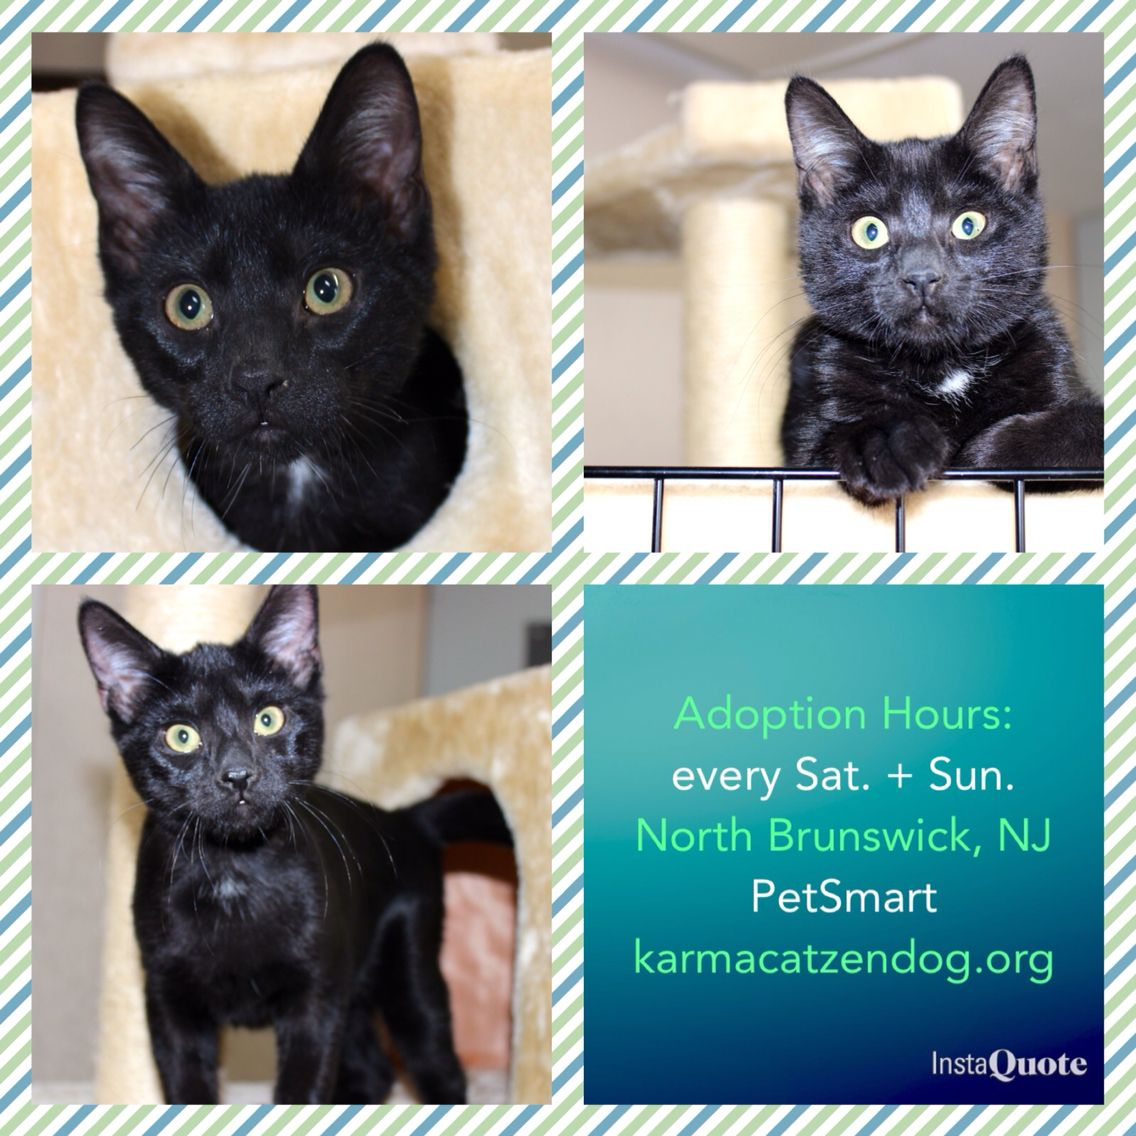 Kittens At The North Brunswick Nj Petsmart Adoption Hours Every